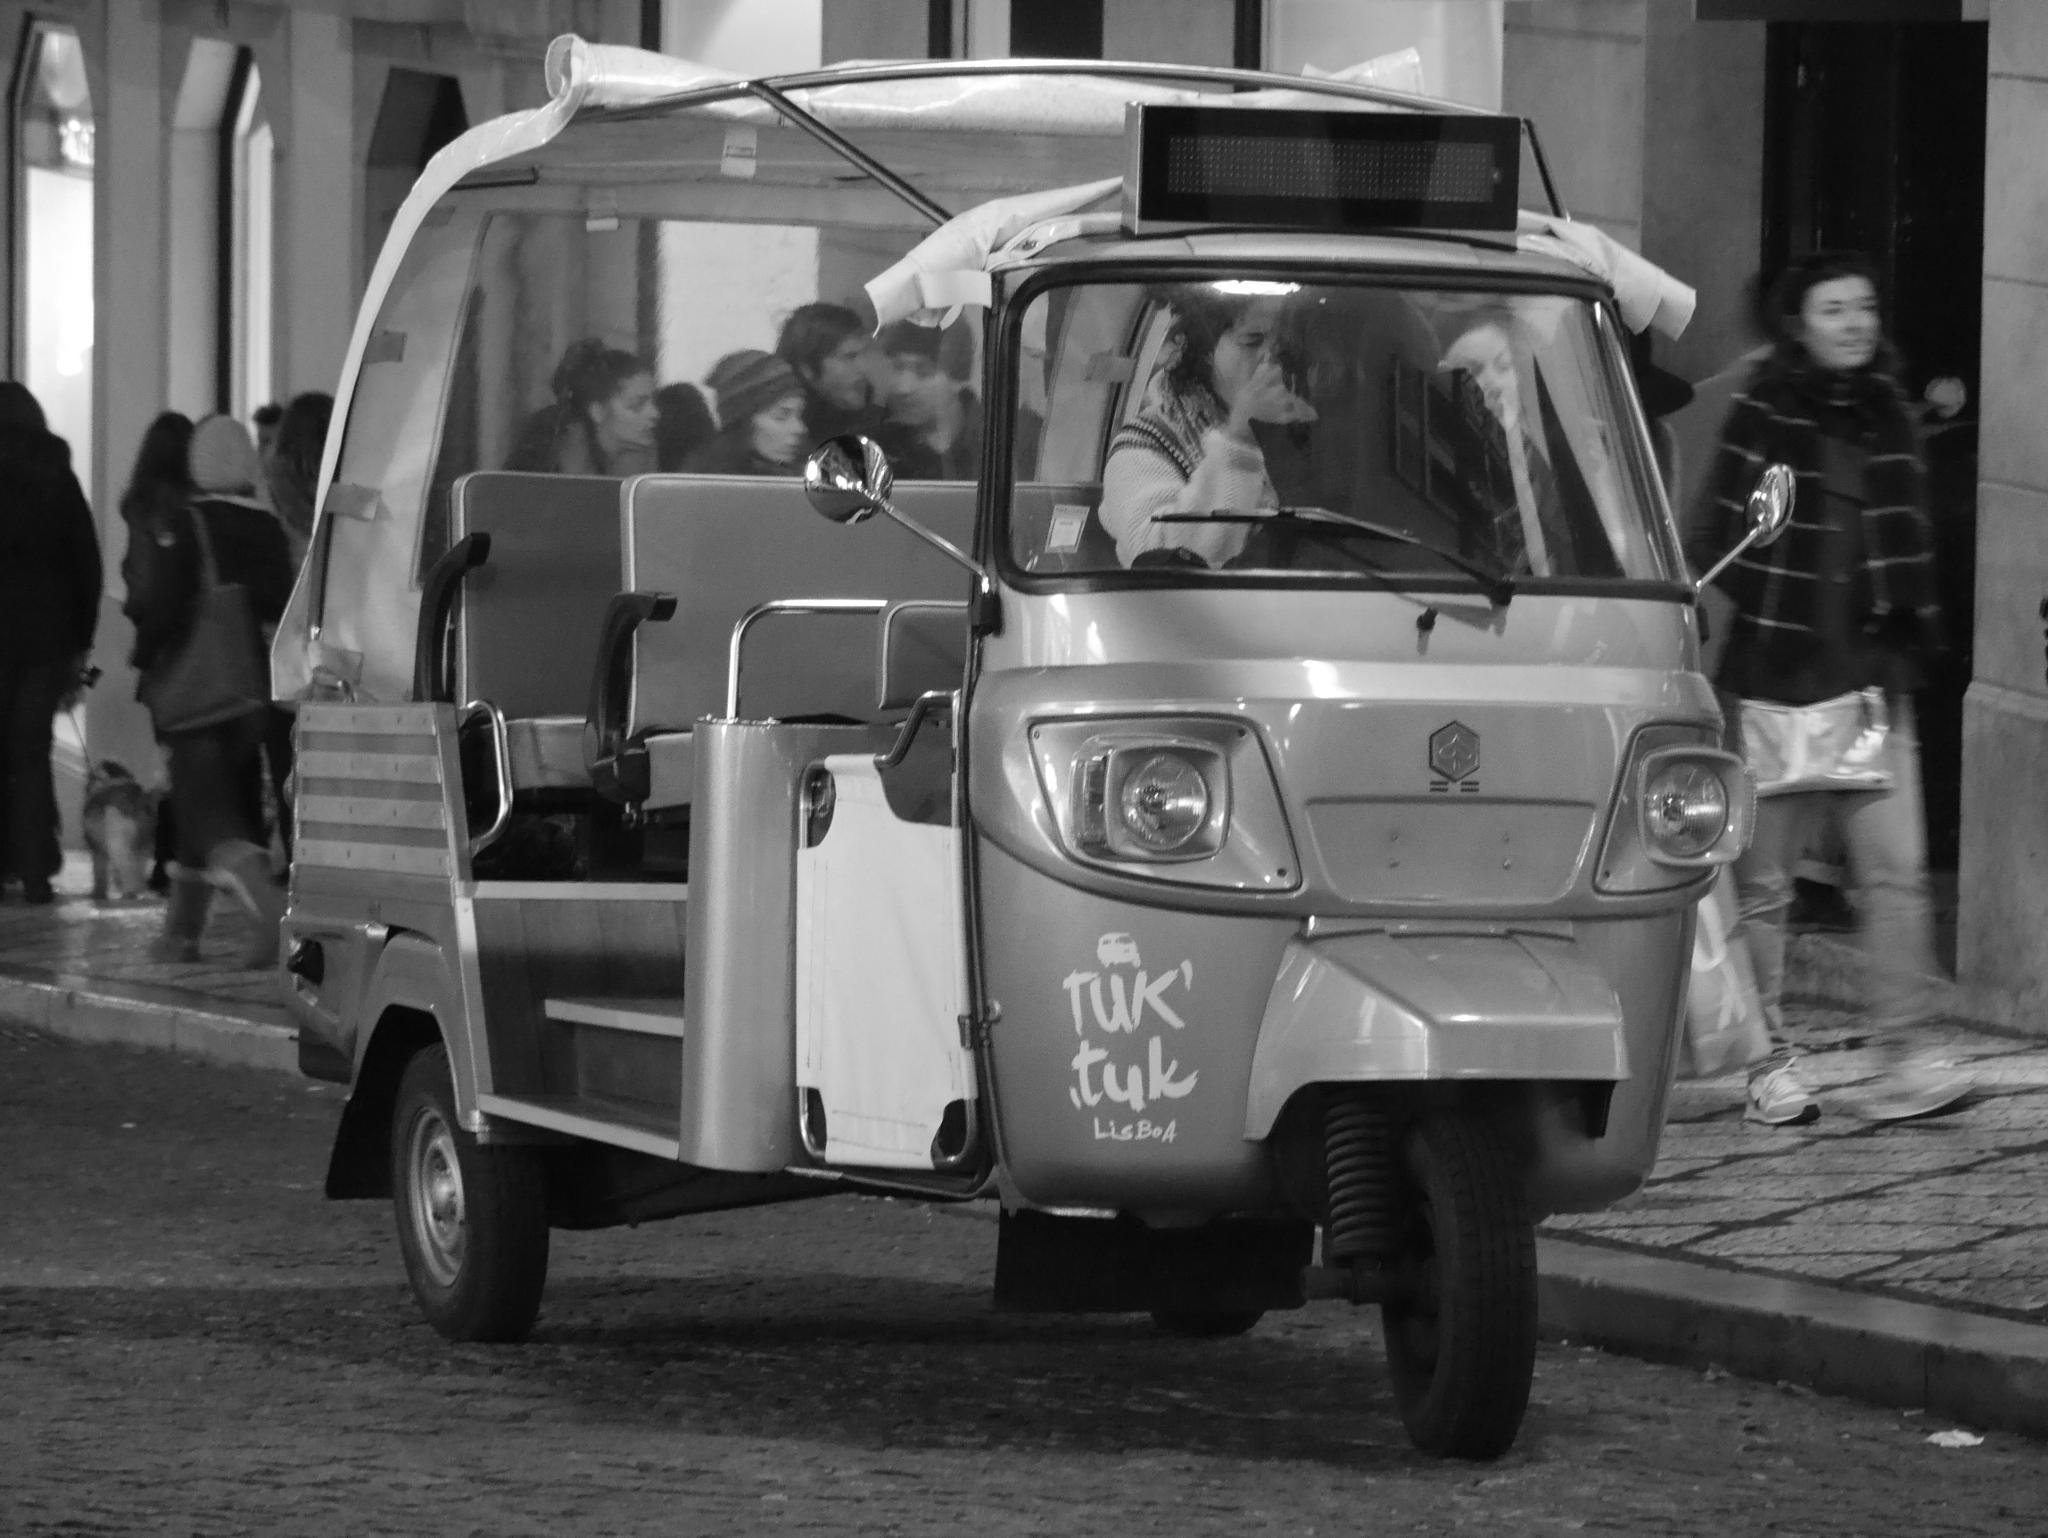 TUK TUK - Waiting for turists by Photosniper